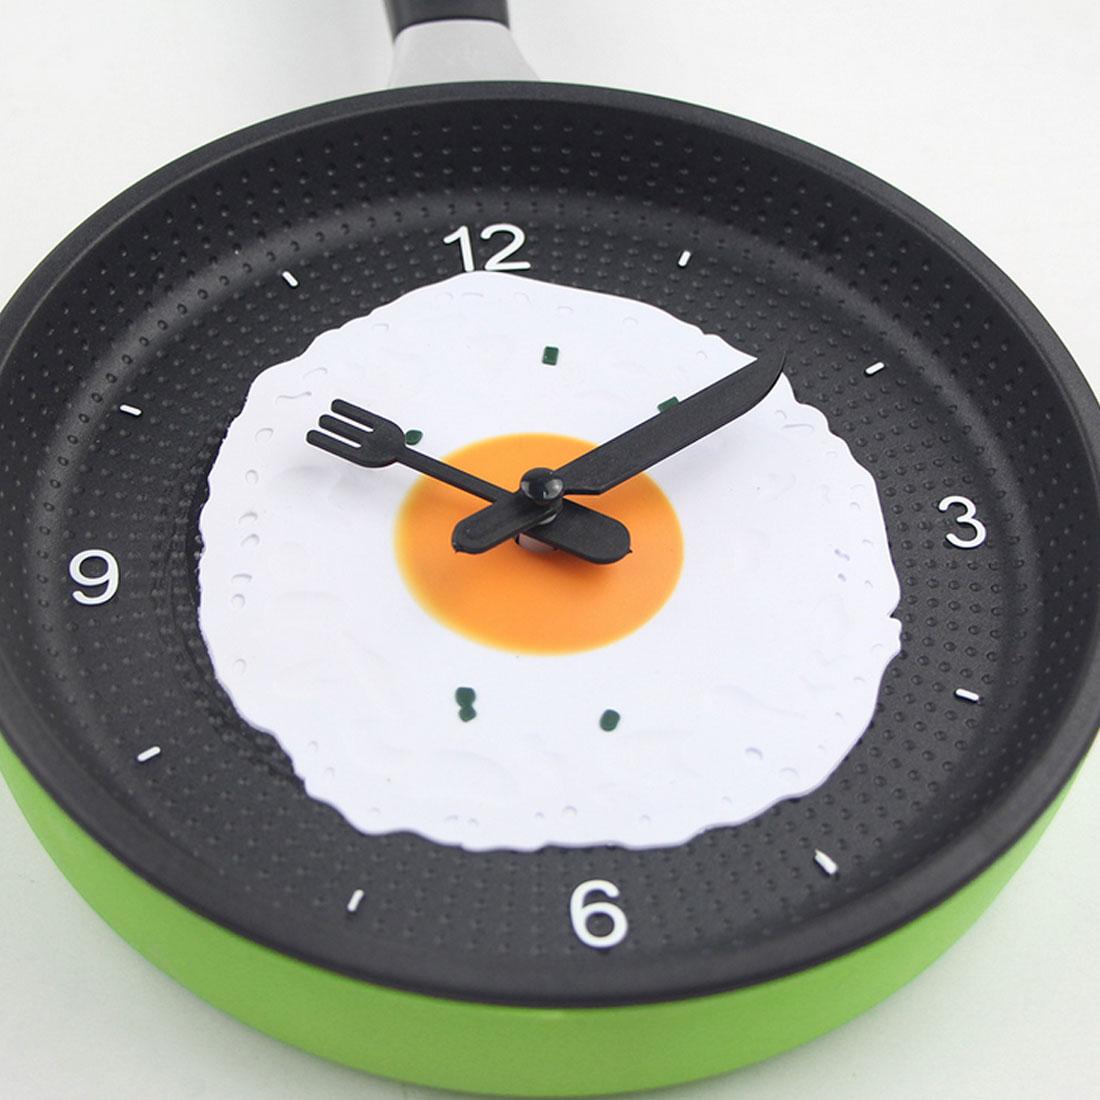 Majestic Design Fried Pan Clock Plastic Kitchen Wall Clock Homedecoration Quartz Time Clocks Horloge Desk Table Clocks Fromhome Design Fried Pan Clock Plastic Kitchen Wall Clock For